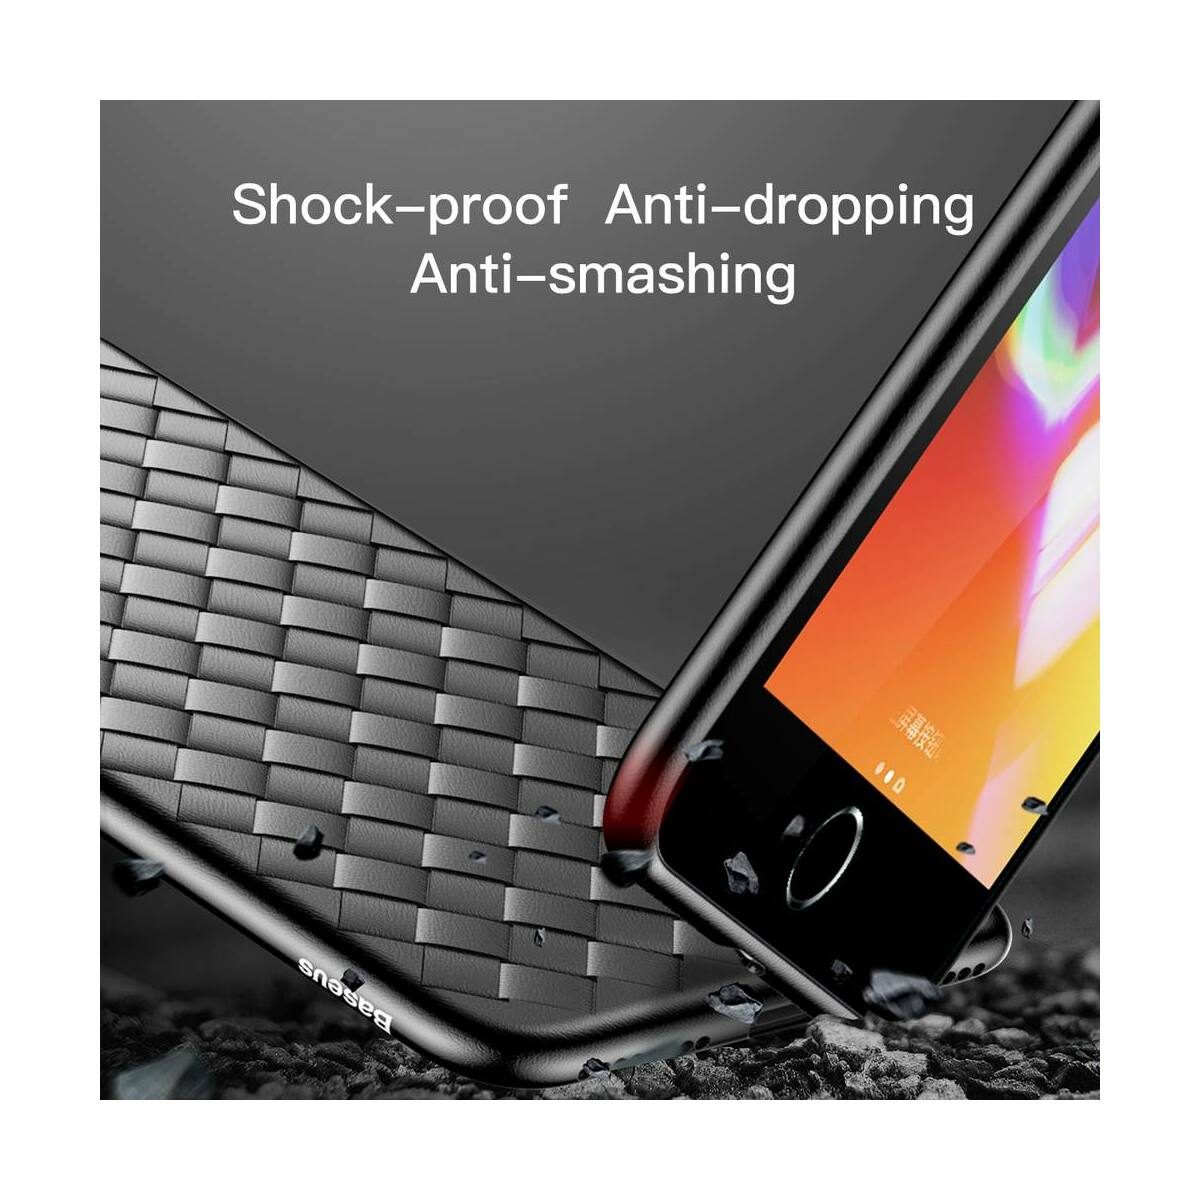 Baseus iPhone 8/7 Plus tok, BV Weaving, fekete (WIAPIPH8P-BV01)